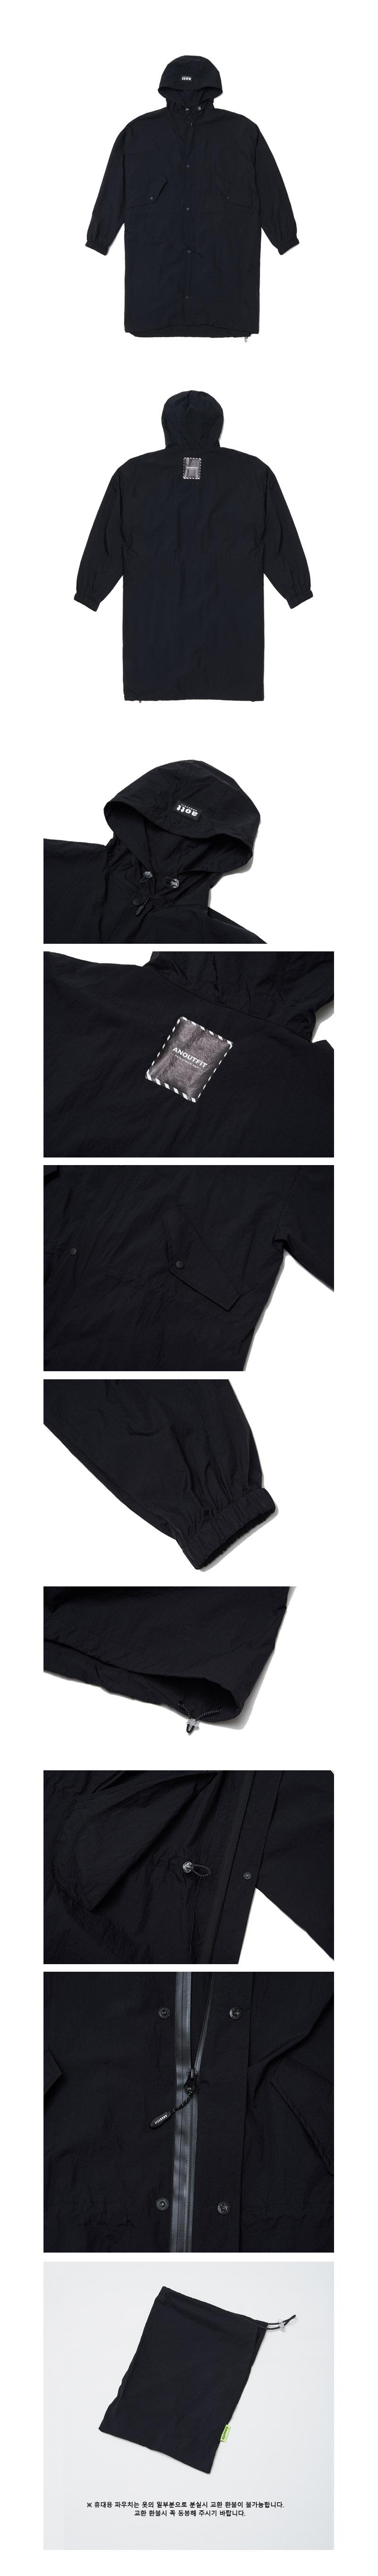 01_BLACK_DETAIL.jpg